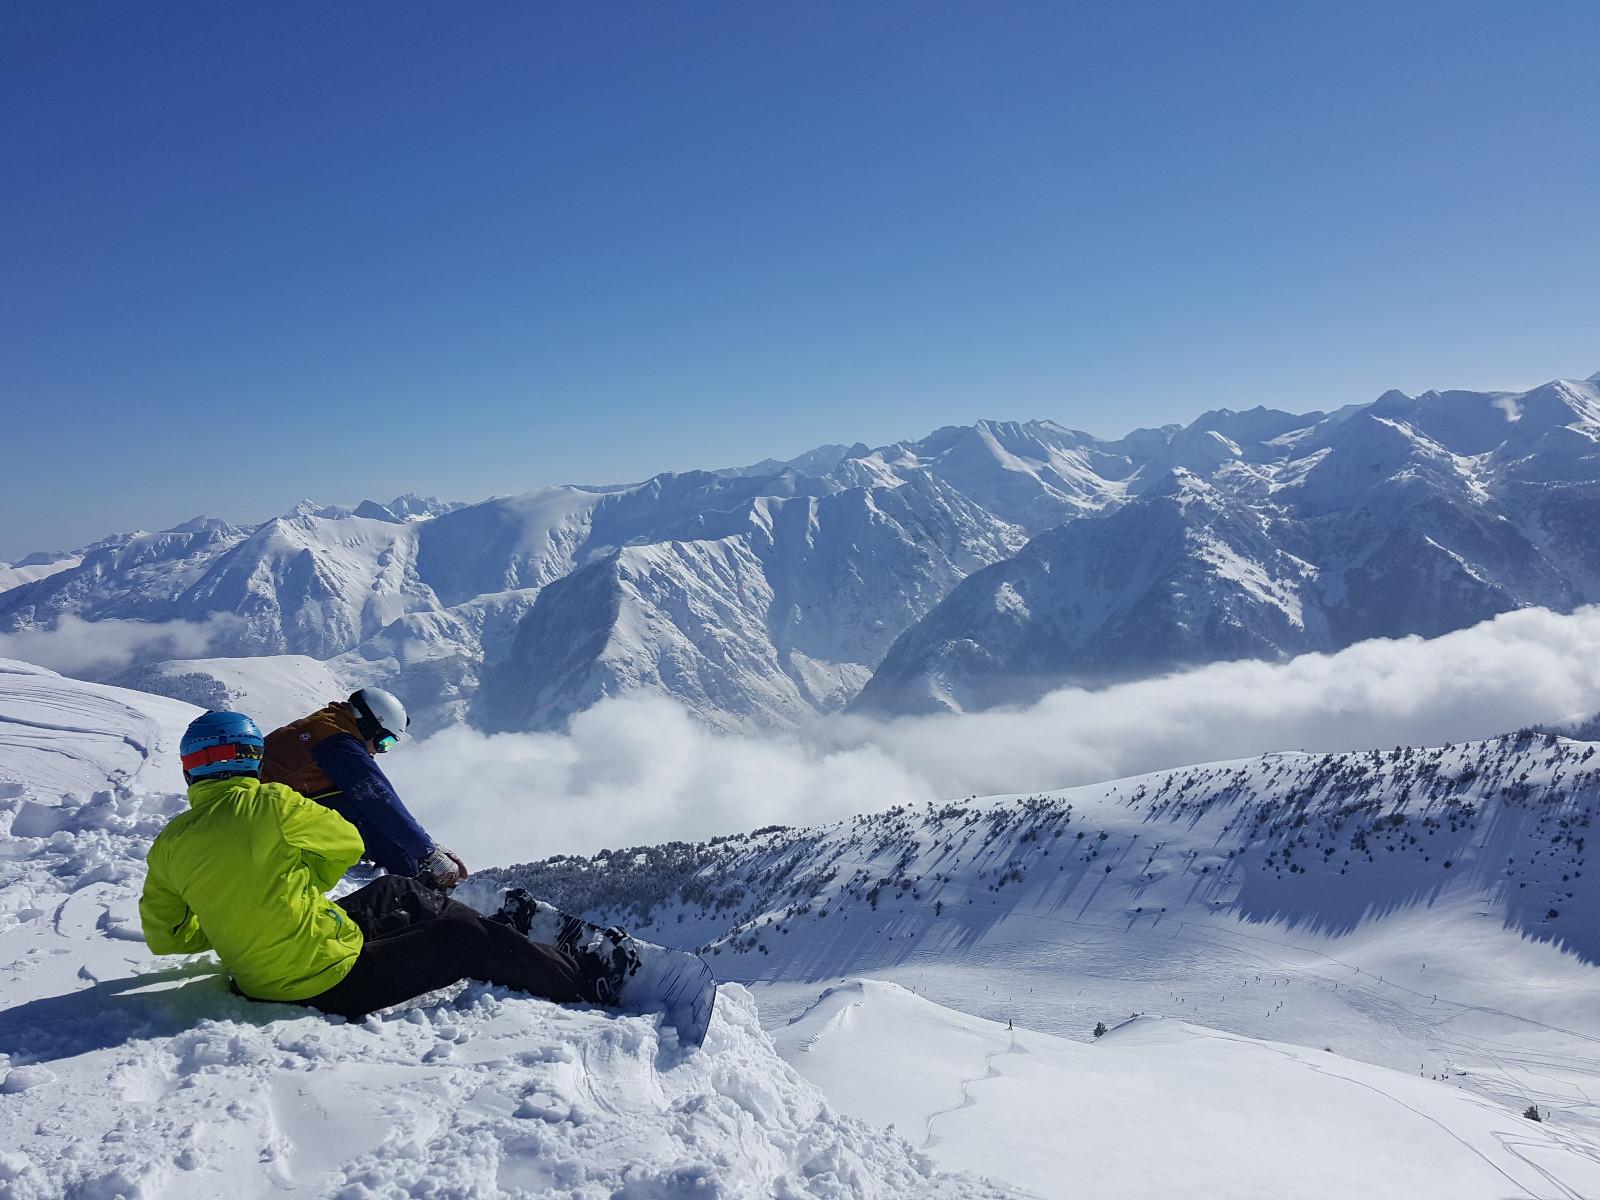 station de ski pyr u00e9n u00e9es ax 3 domaines